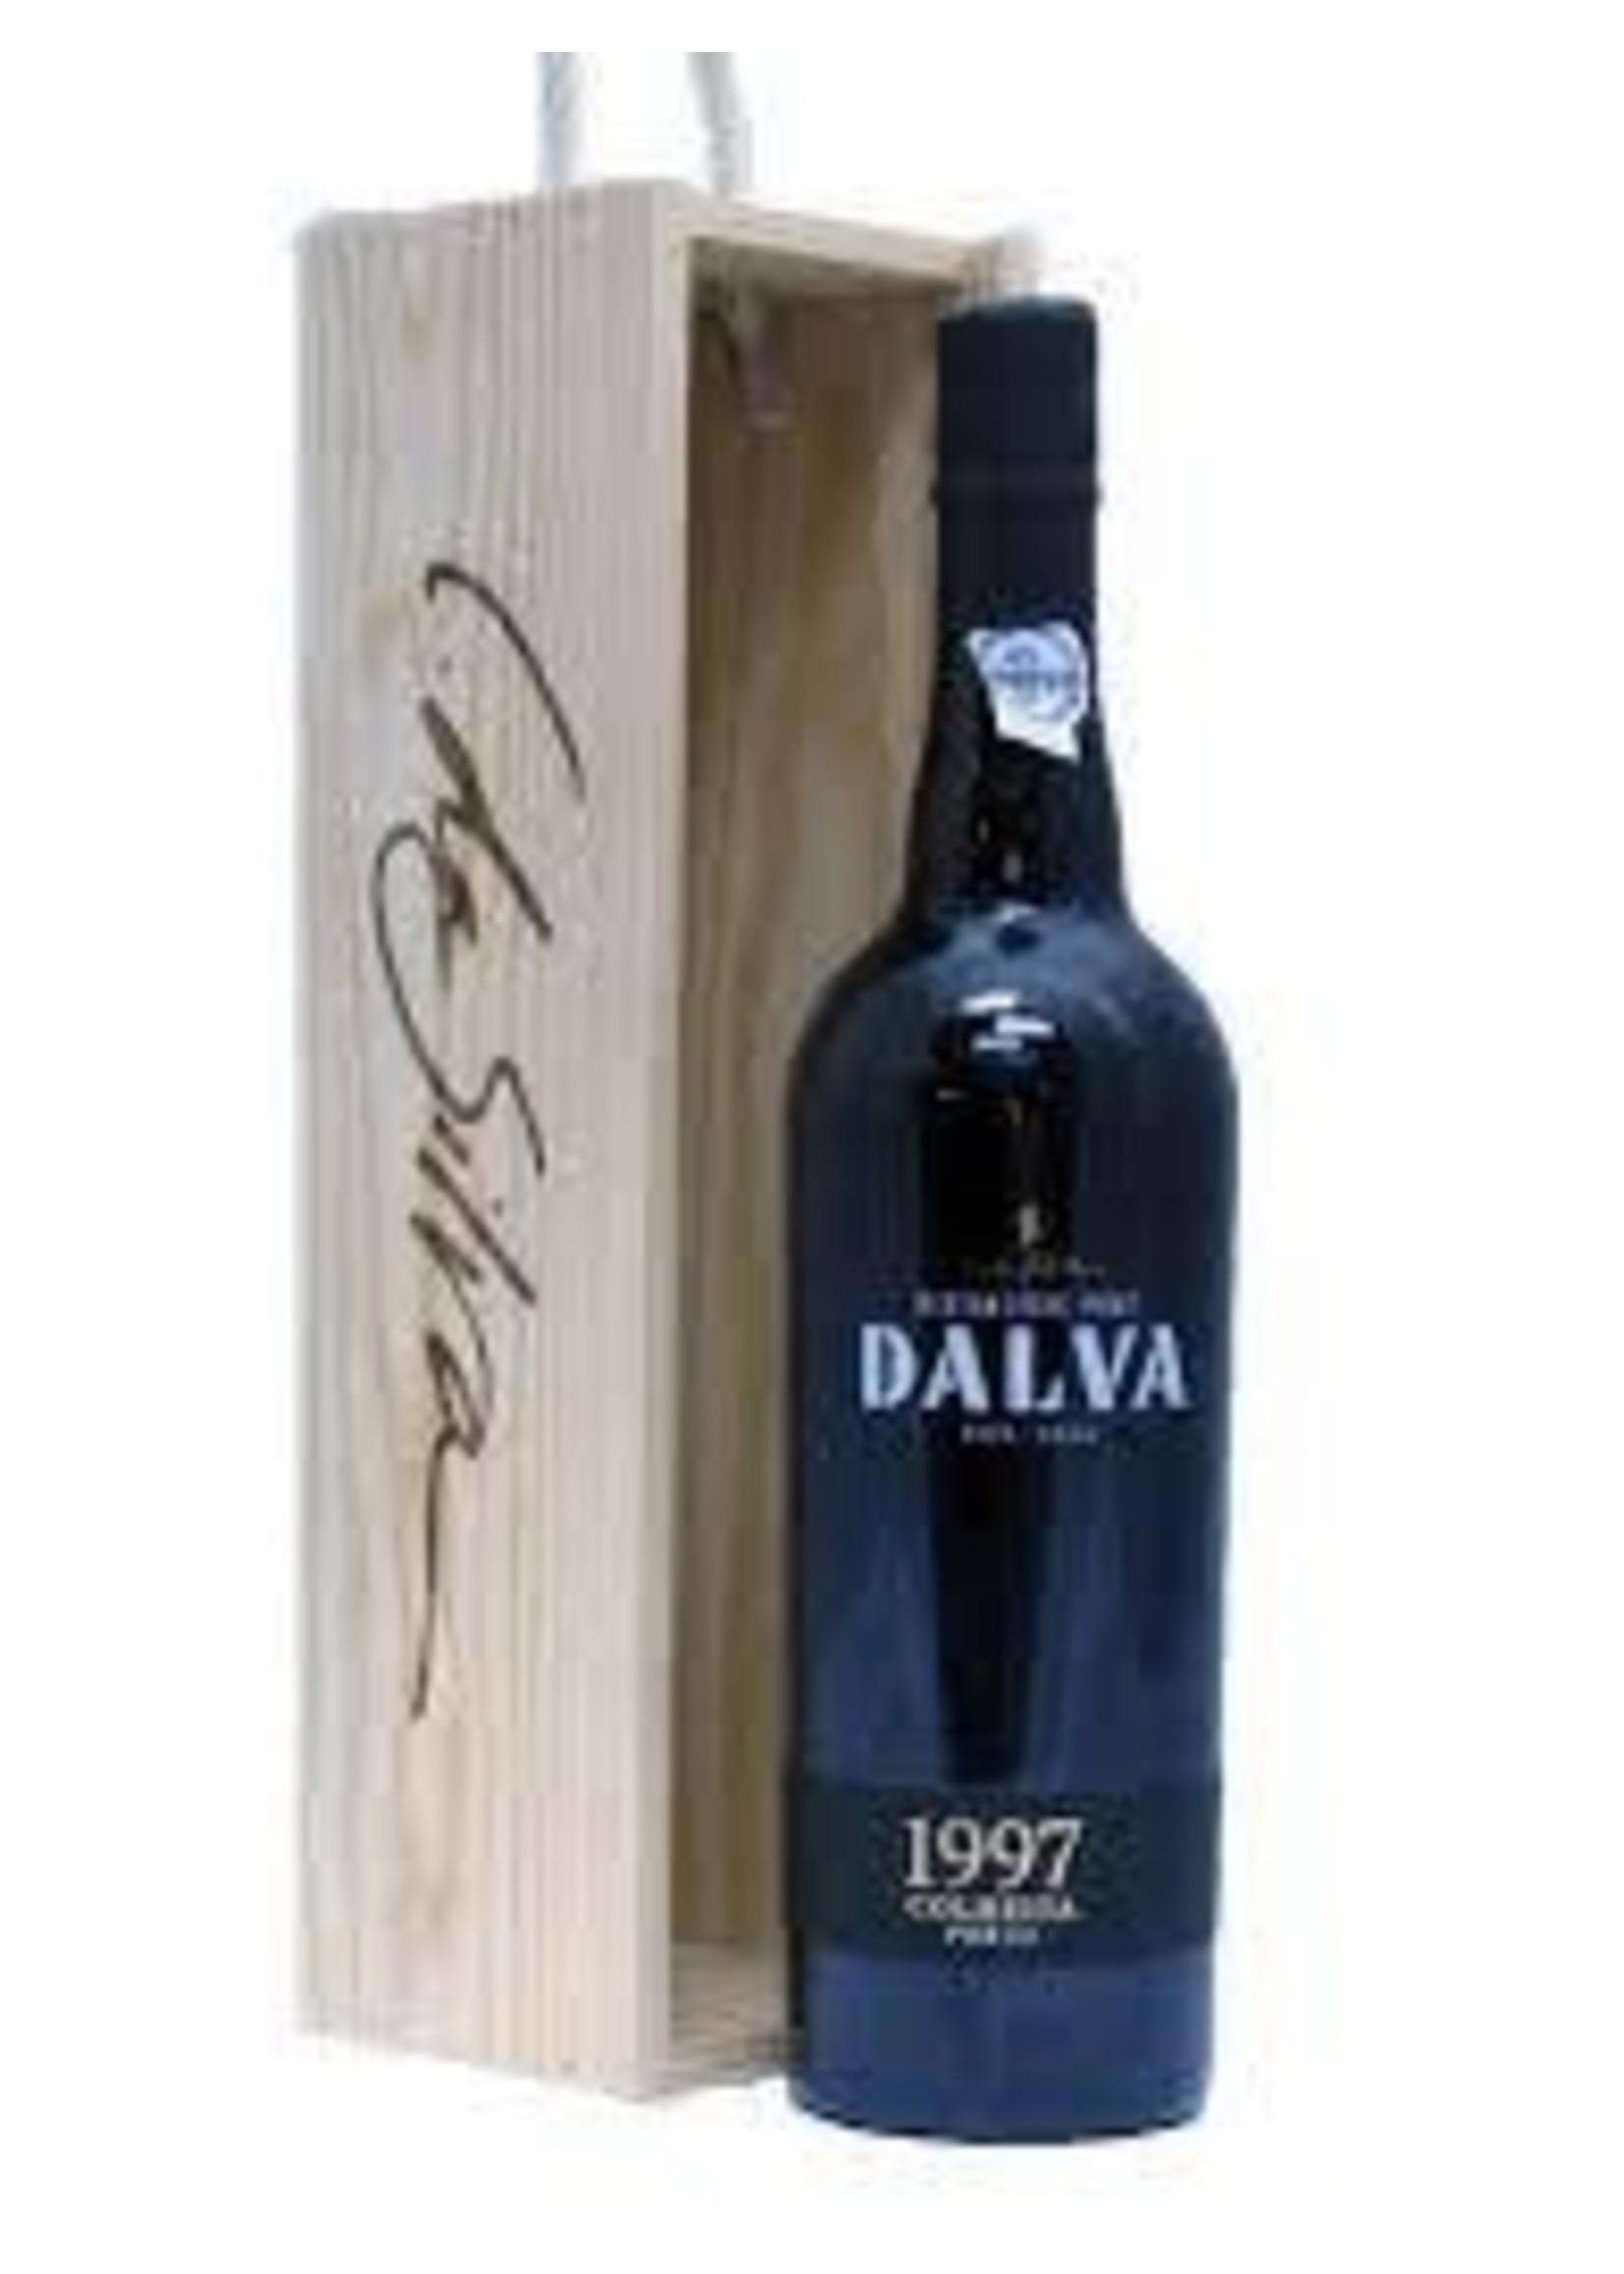 Dalva Dalva / Porto Colheita 1997 / 750mL